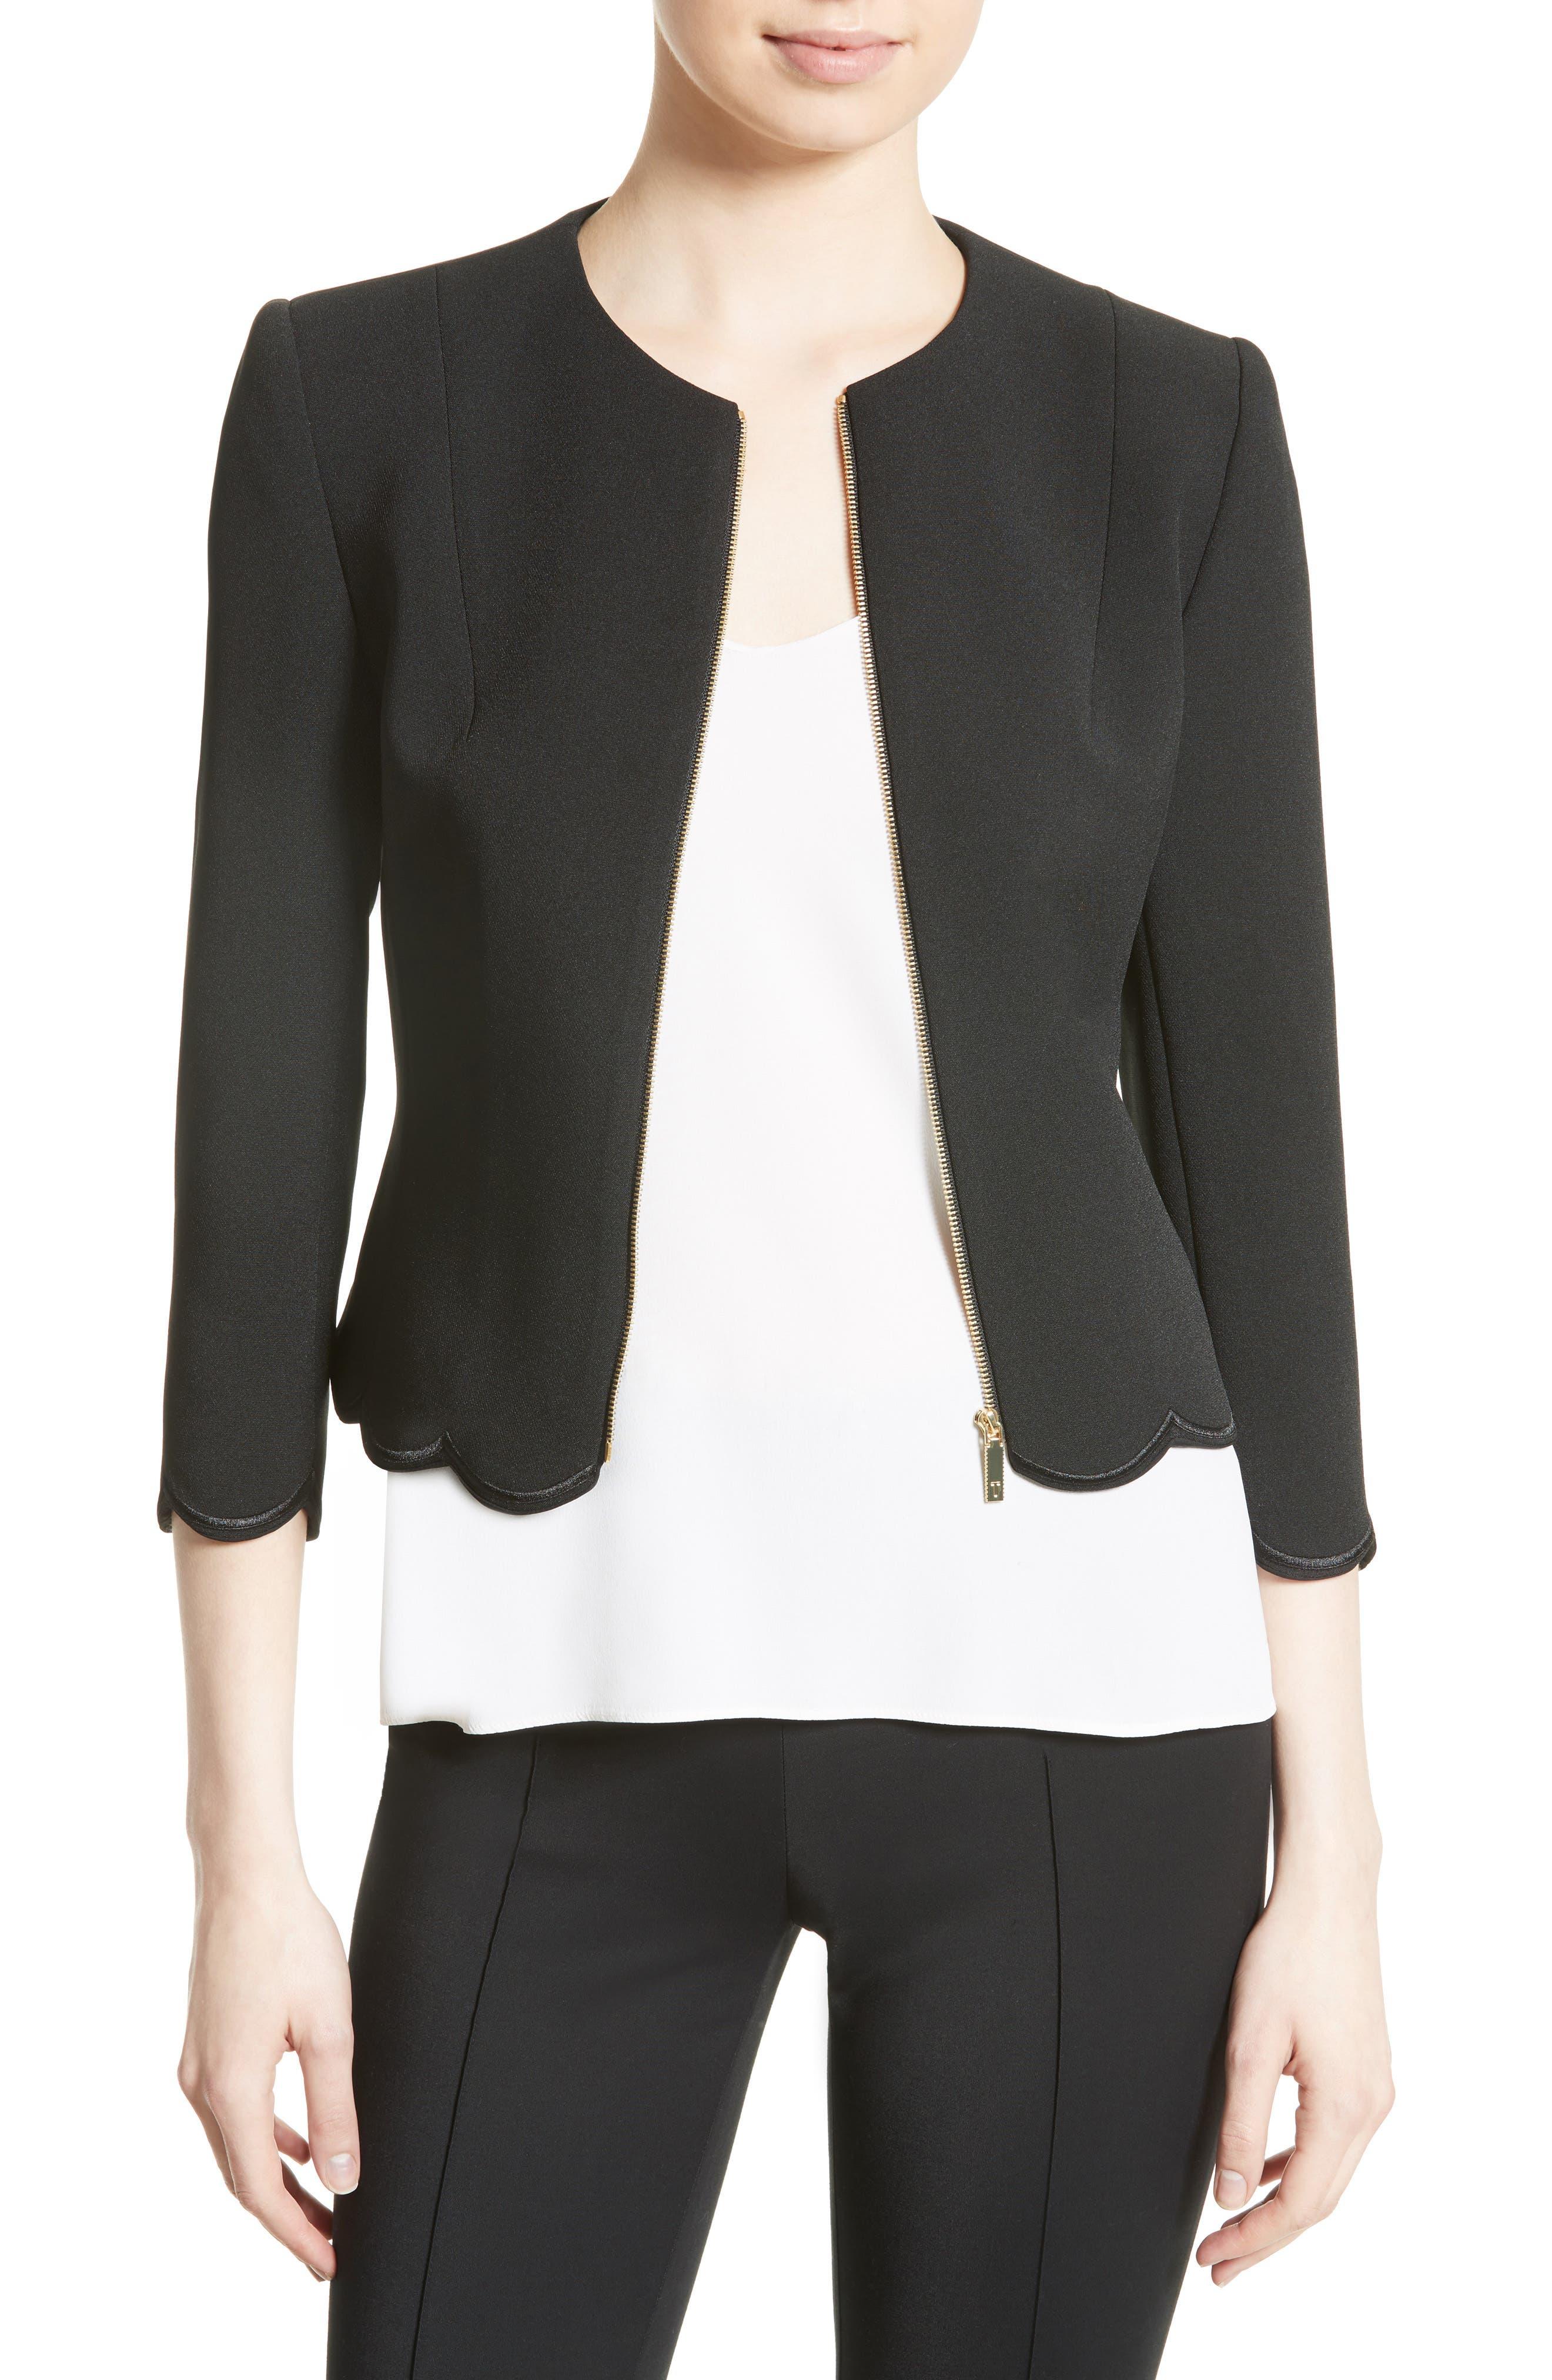 Heraly Crop Jacket,                         Main,                         color, 001